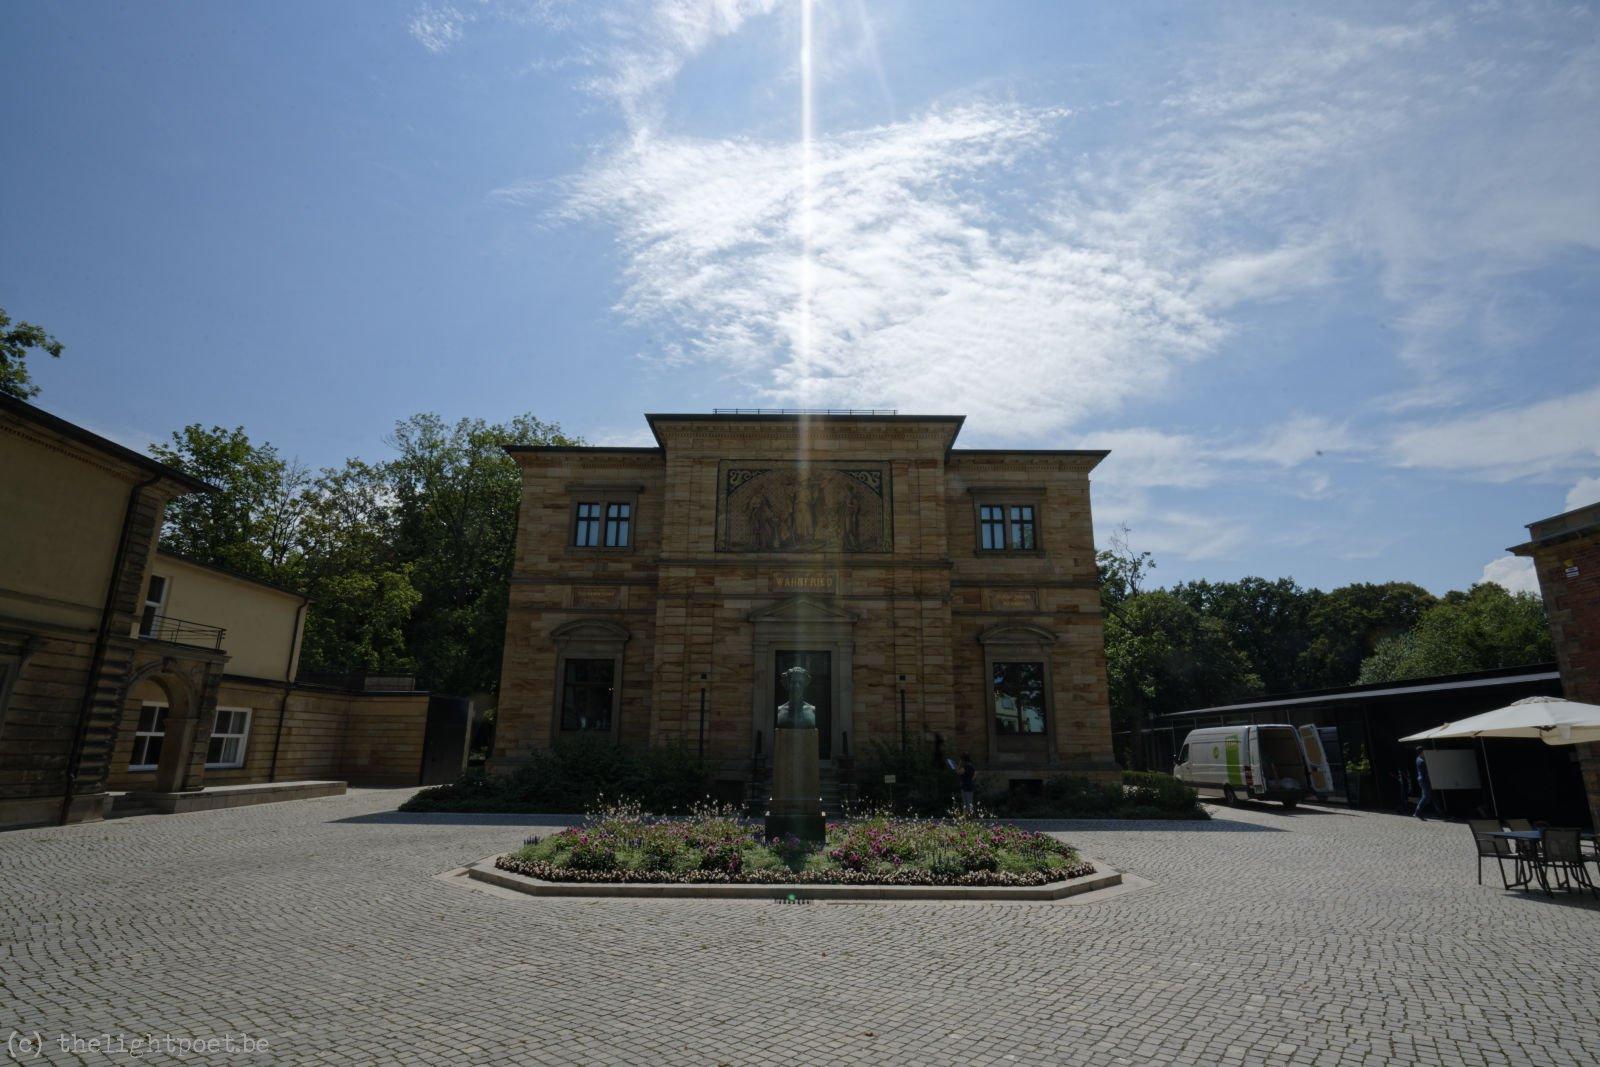 2018_07_Bayreuth_20180716_133749_DxO_PL1_1600px